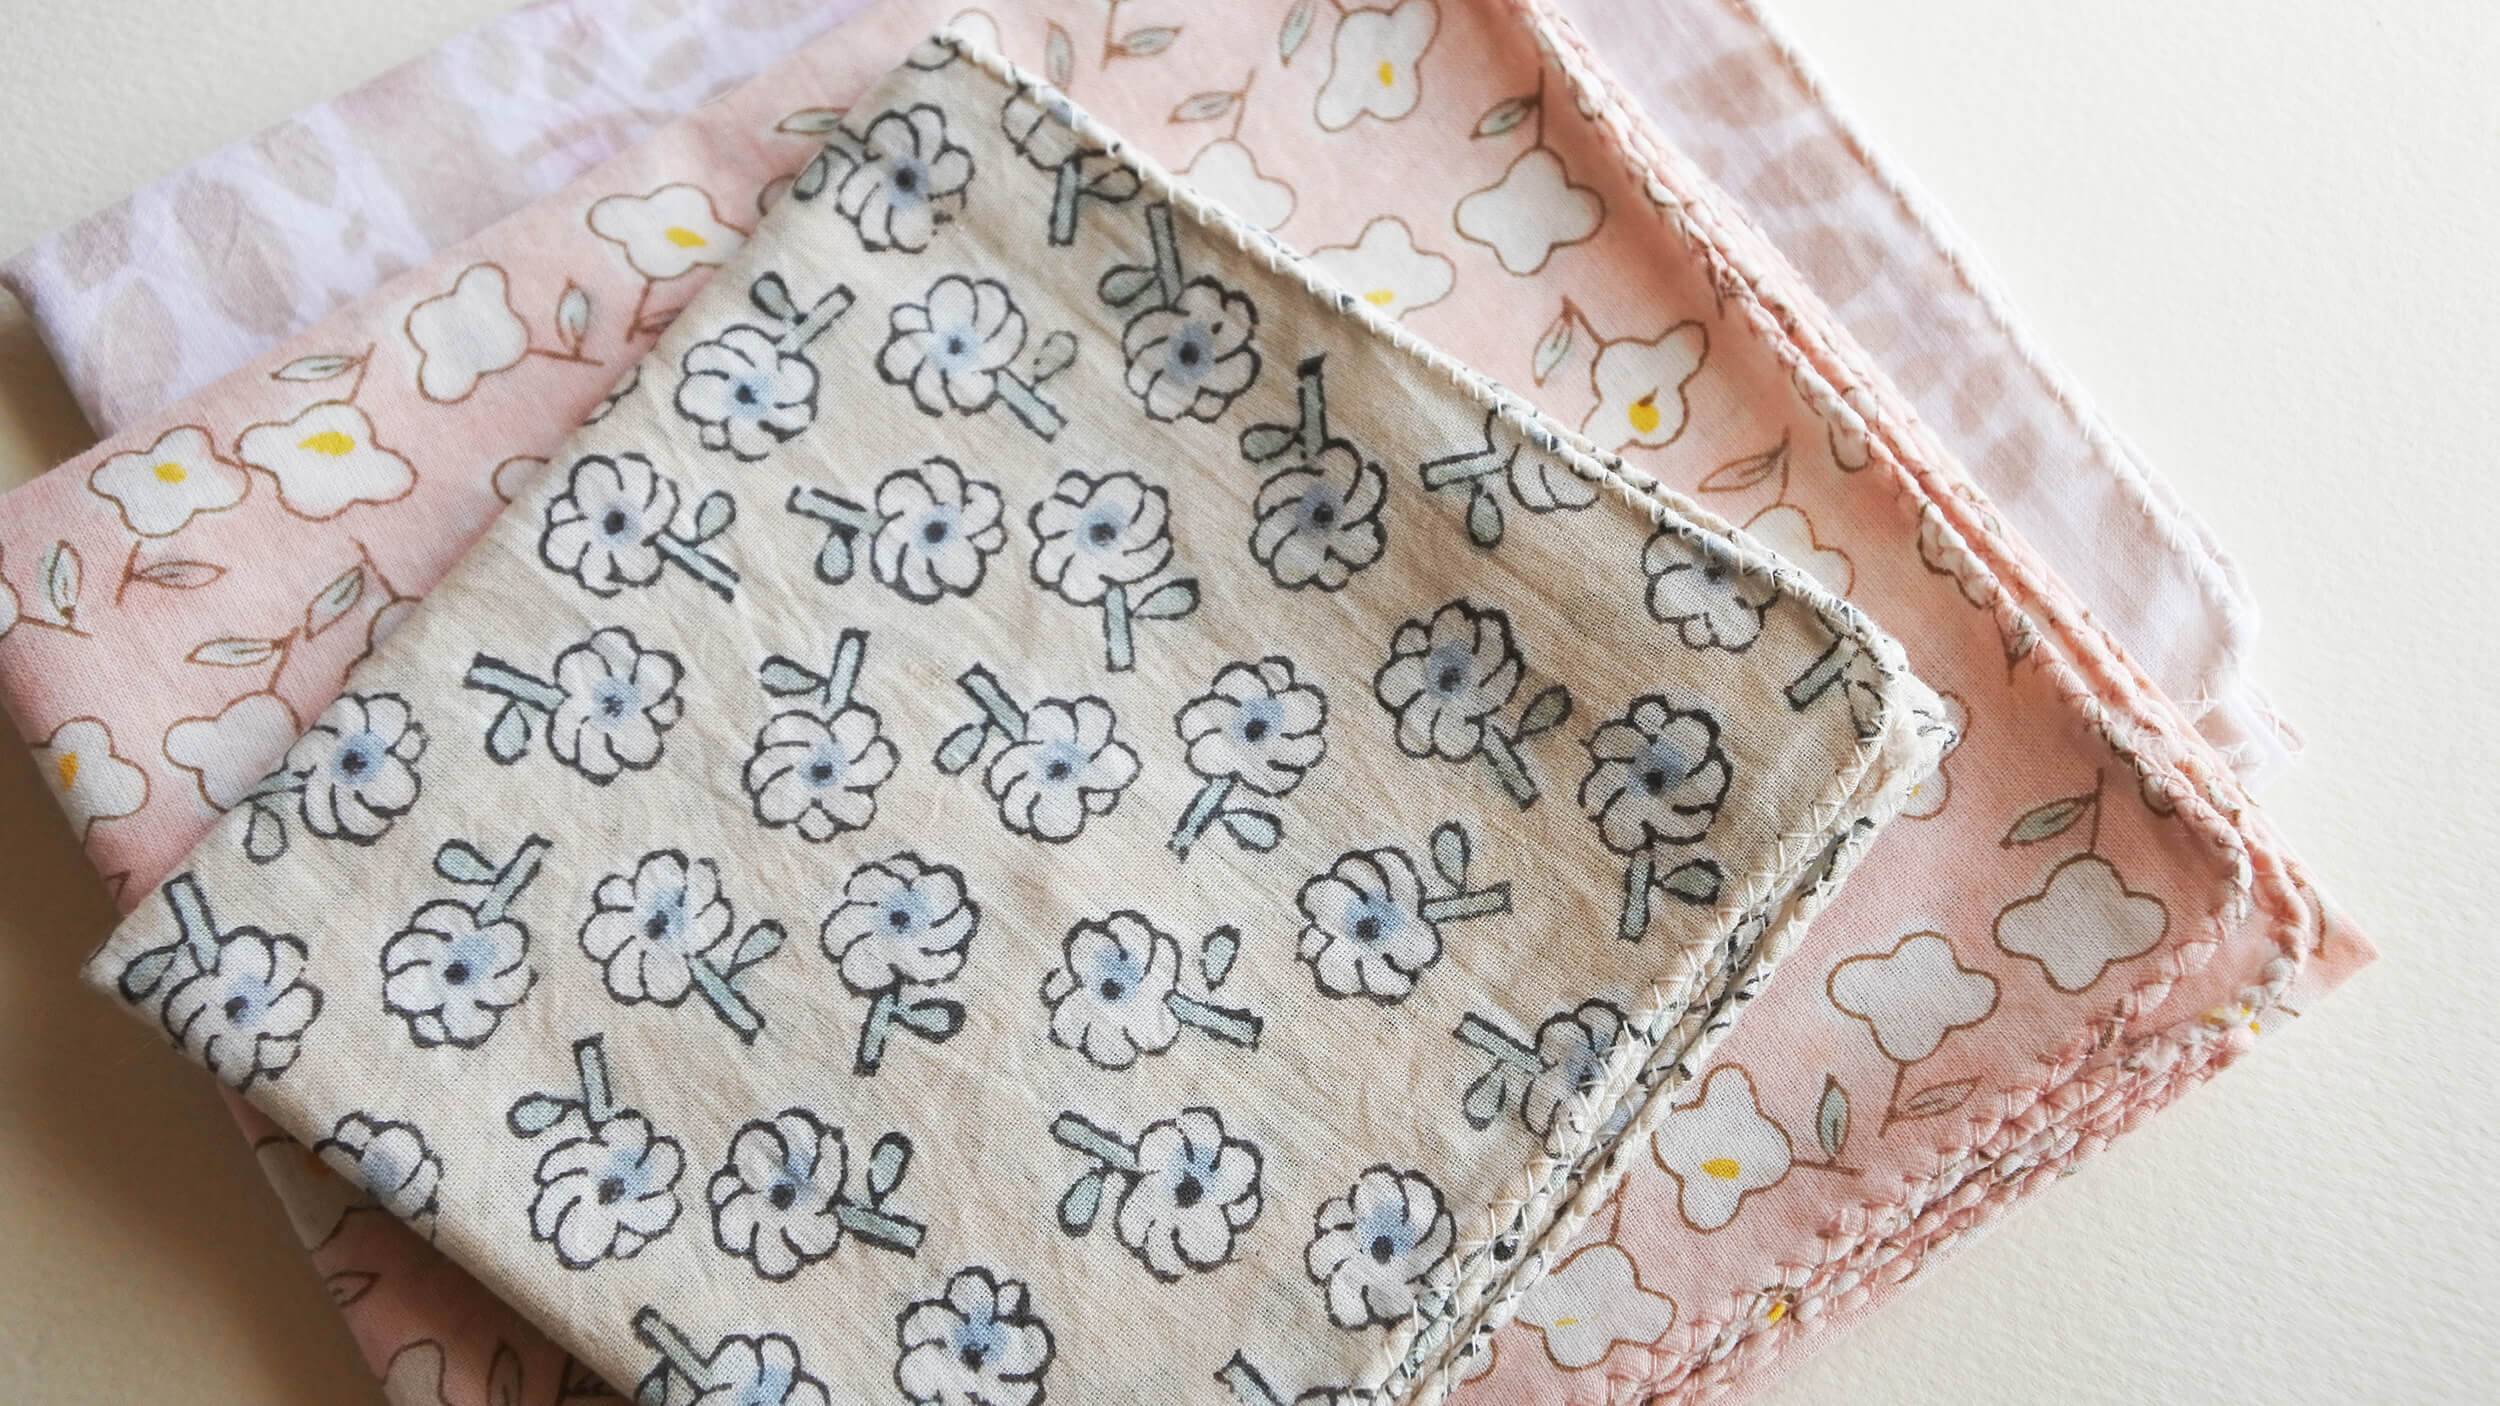 Pattern Hanauta 04 Handkerchief and Picnic 02,Minori 03 Bandana